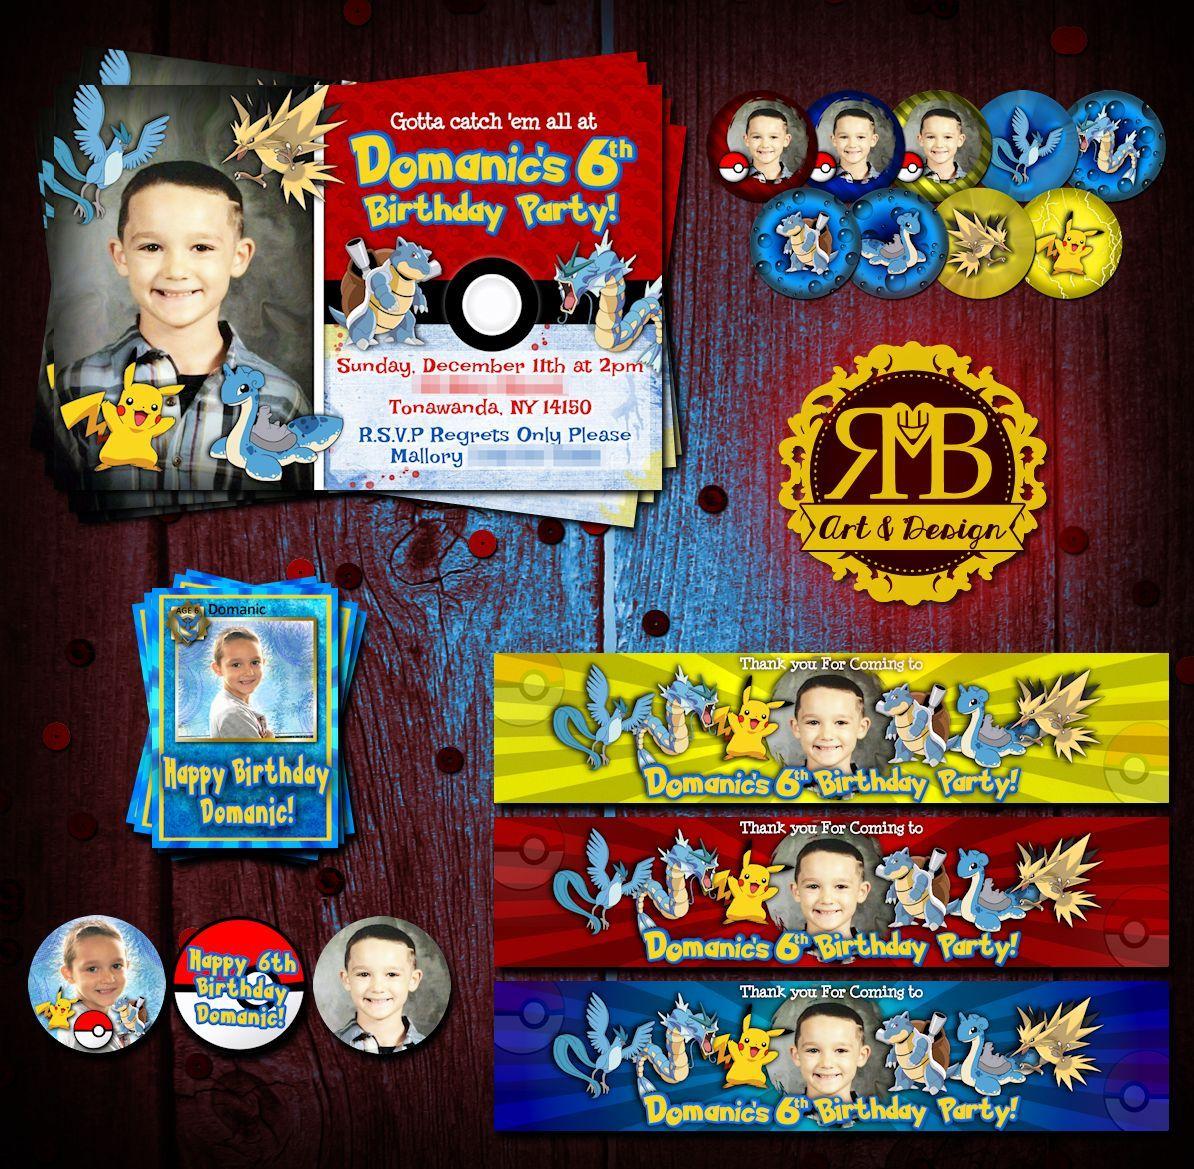 Pokémon Themed birthday package designed by RMB Art & Design https://www.facebook.com/RMBArtAndDesign/